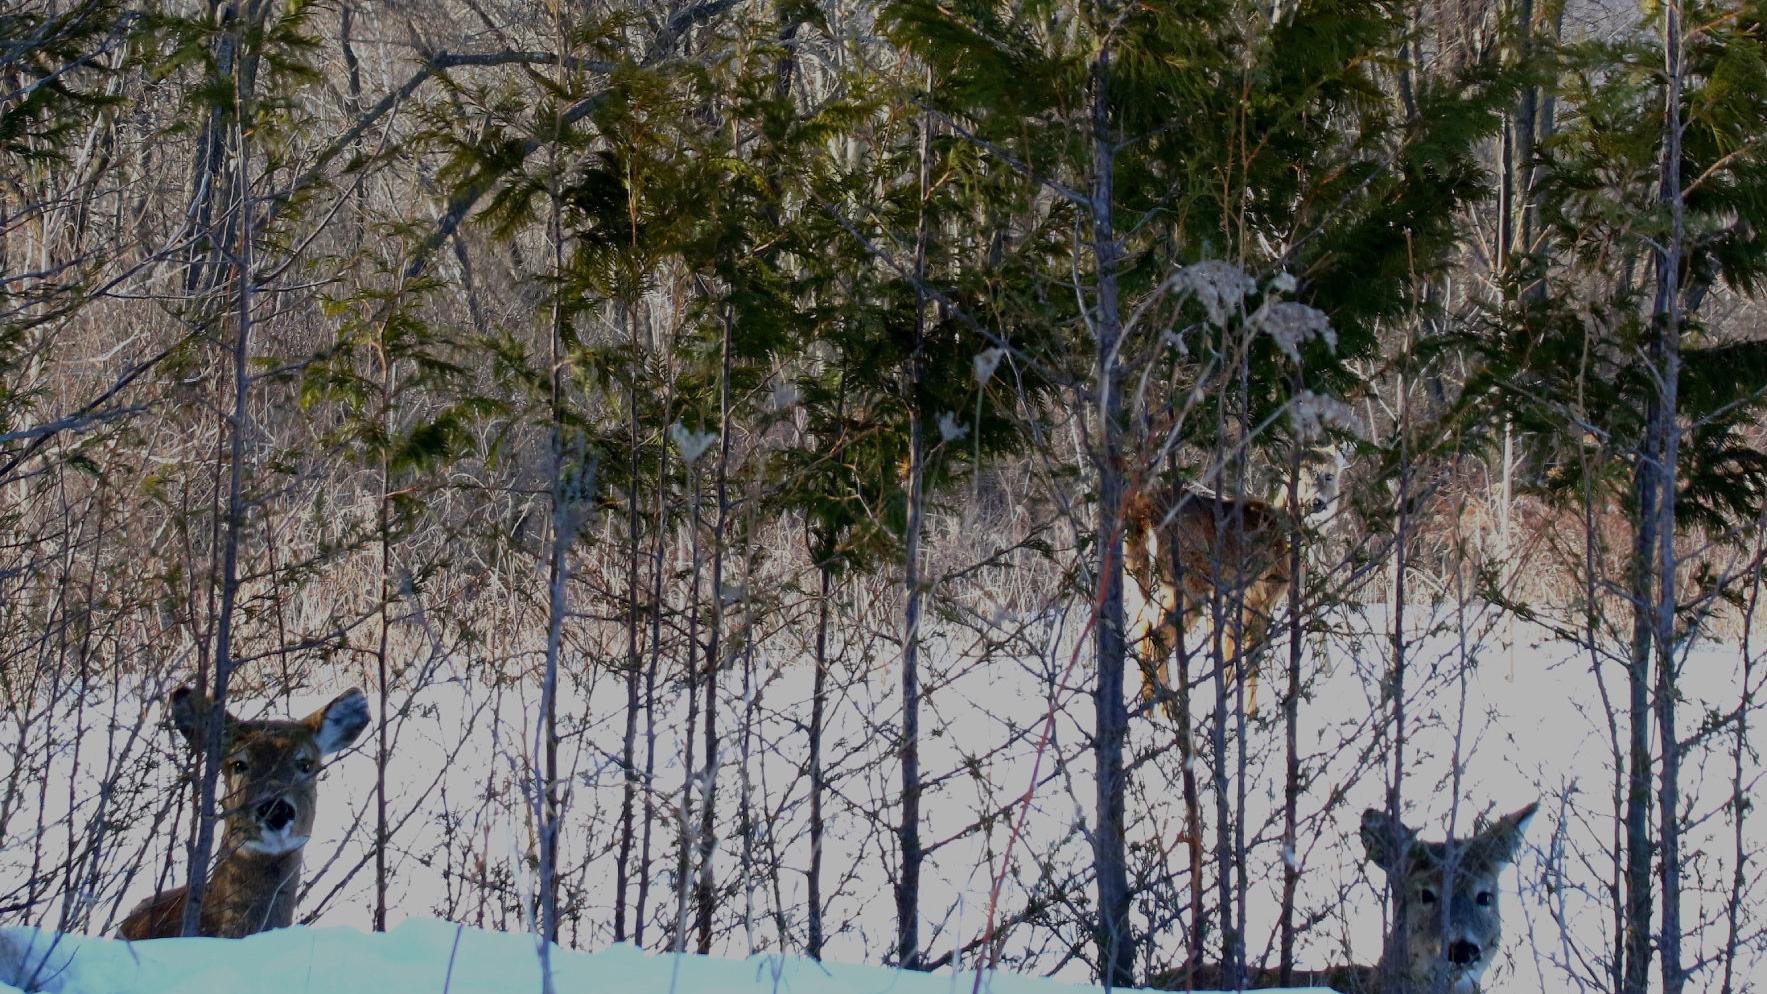 DAVIS COLUMN: Rough winter likely taking a toll on deer herd